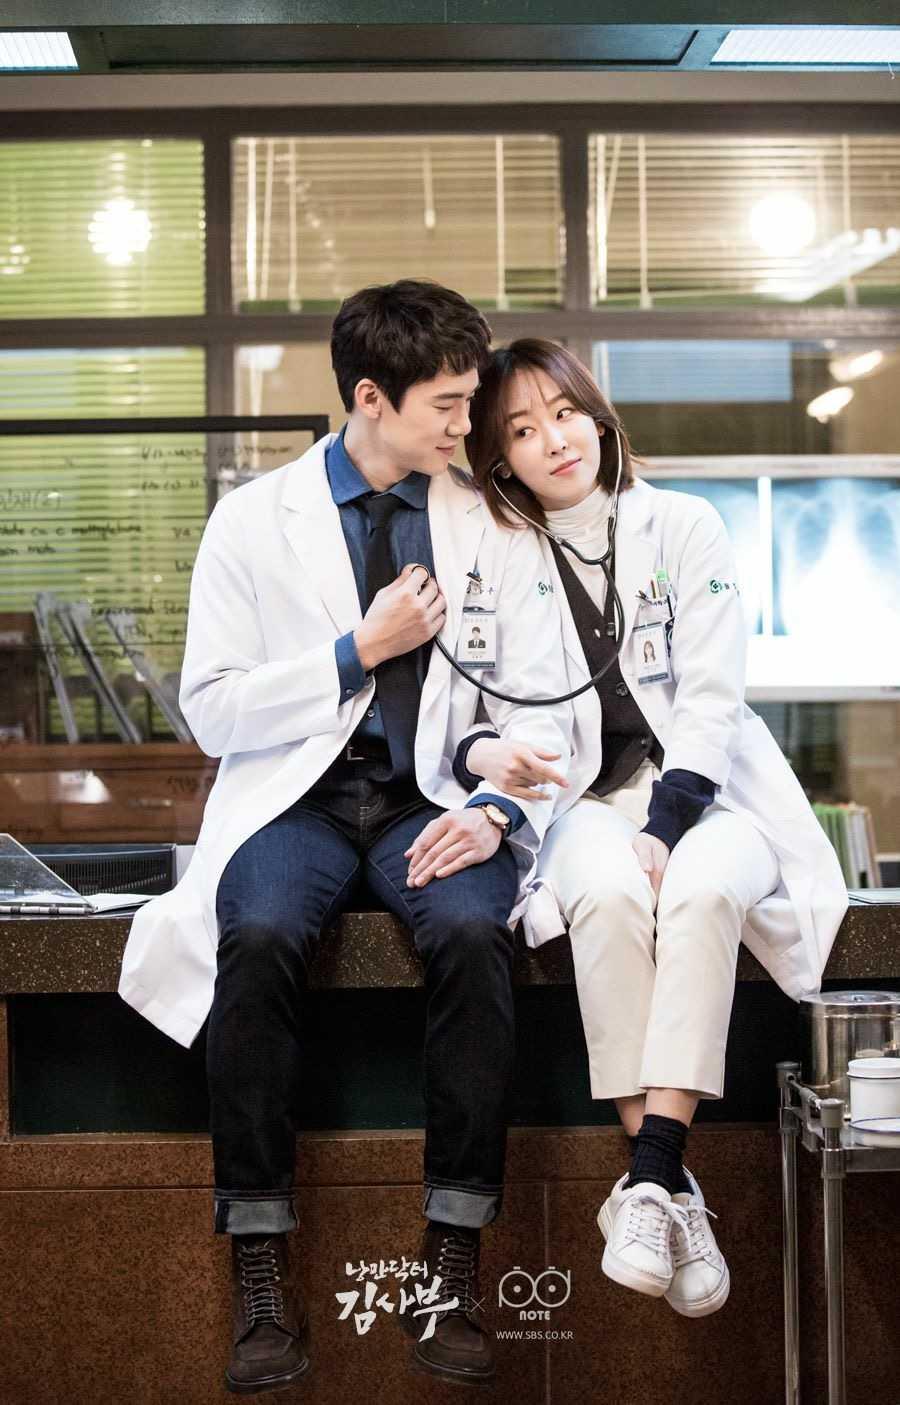 romantic-doctor-teacher-kim-ตอนที่-1-21-ตอนพิเศษ-ซับไทย-จบ-